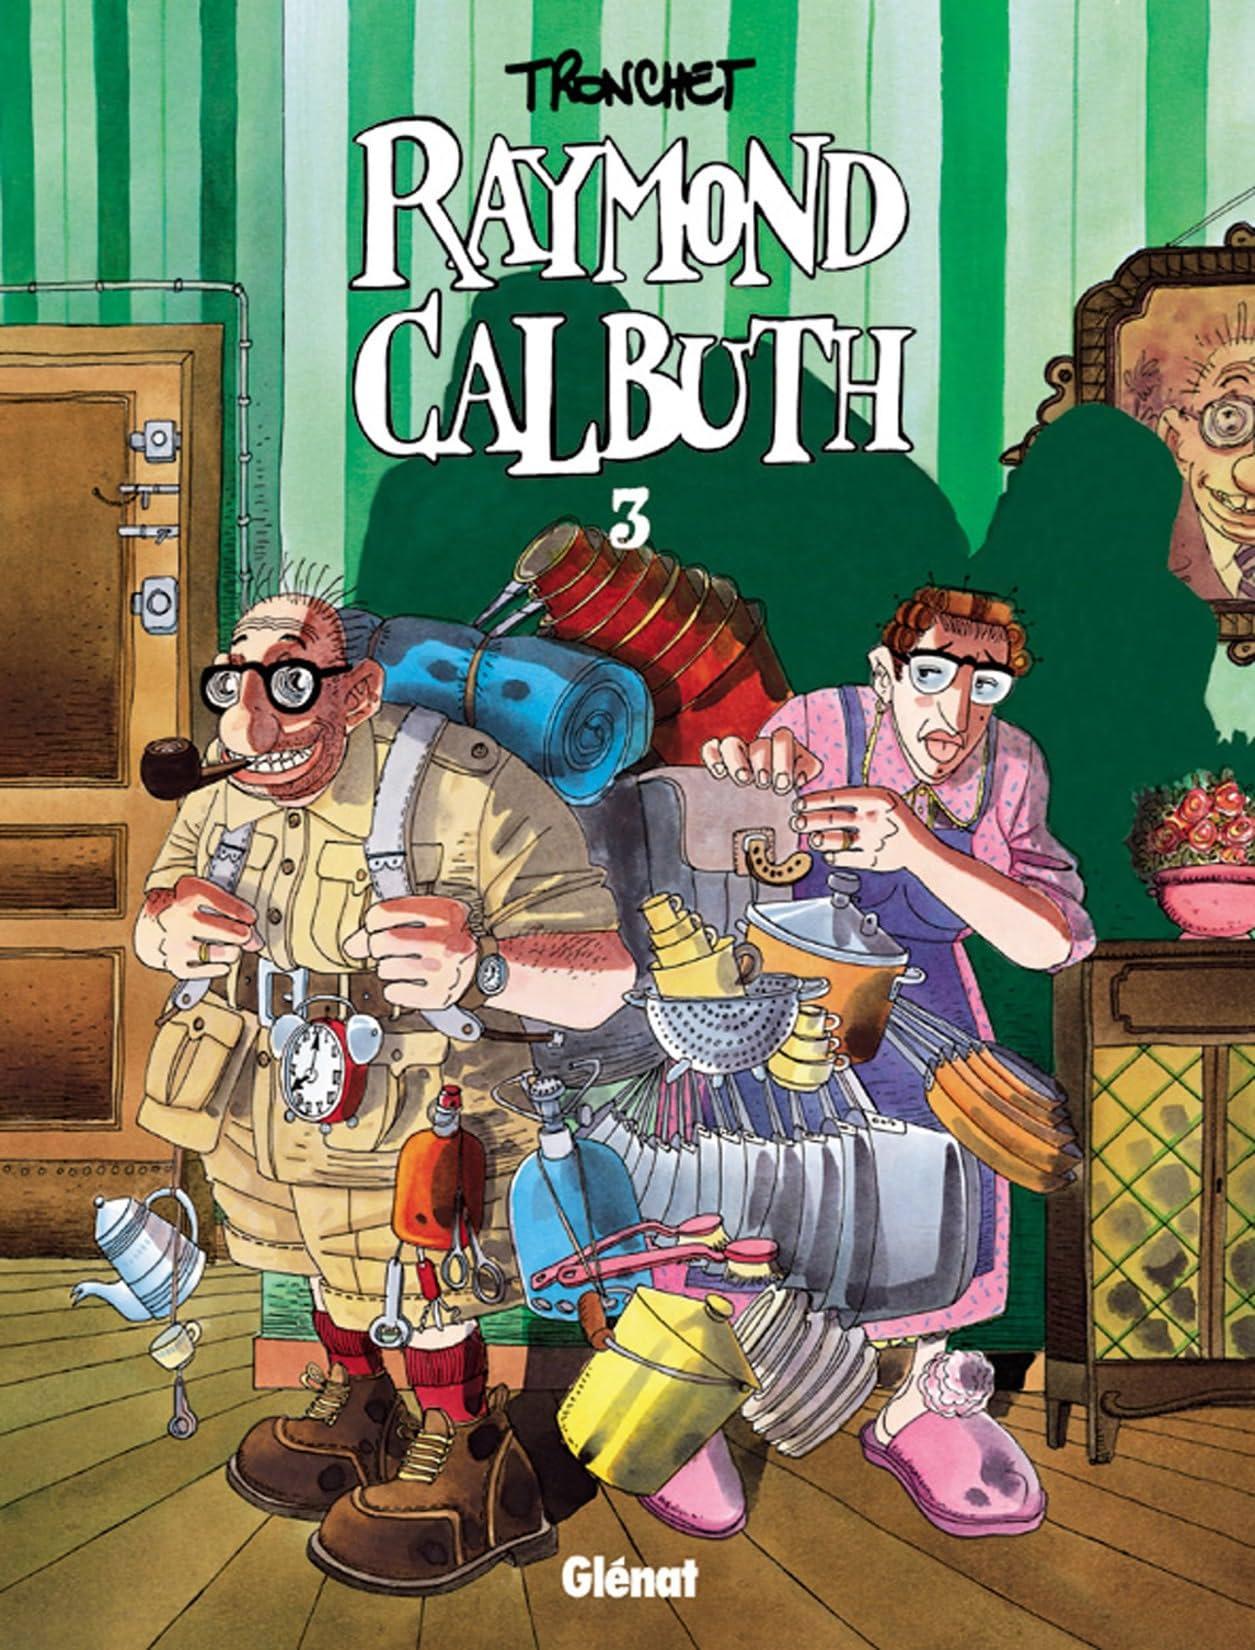 Raymond Calbuth Vol. 3